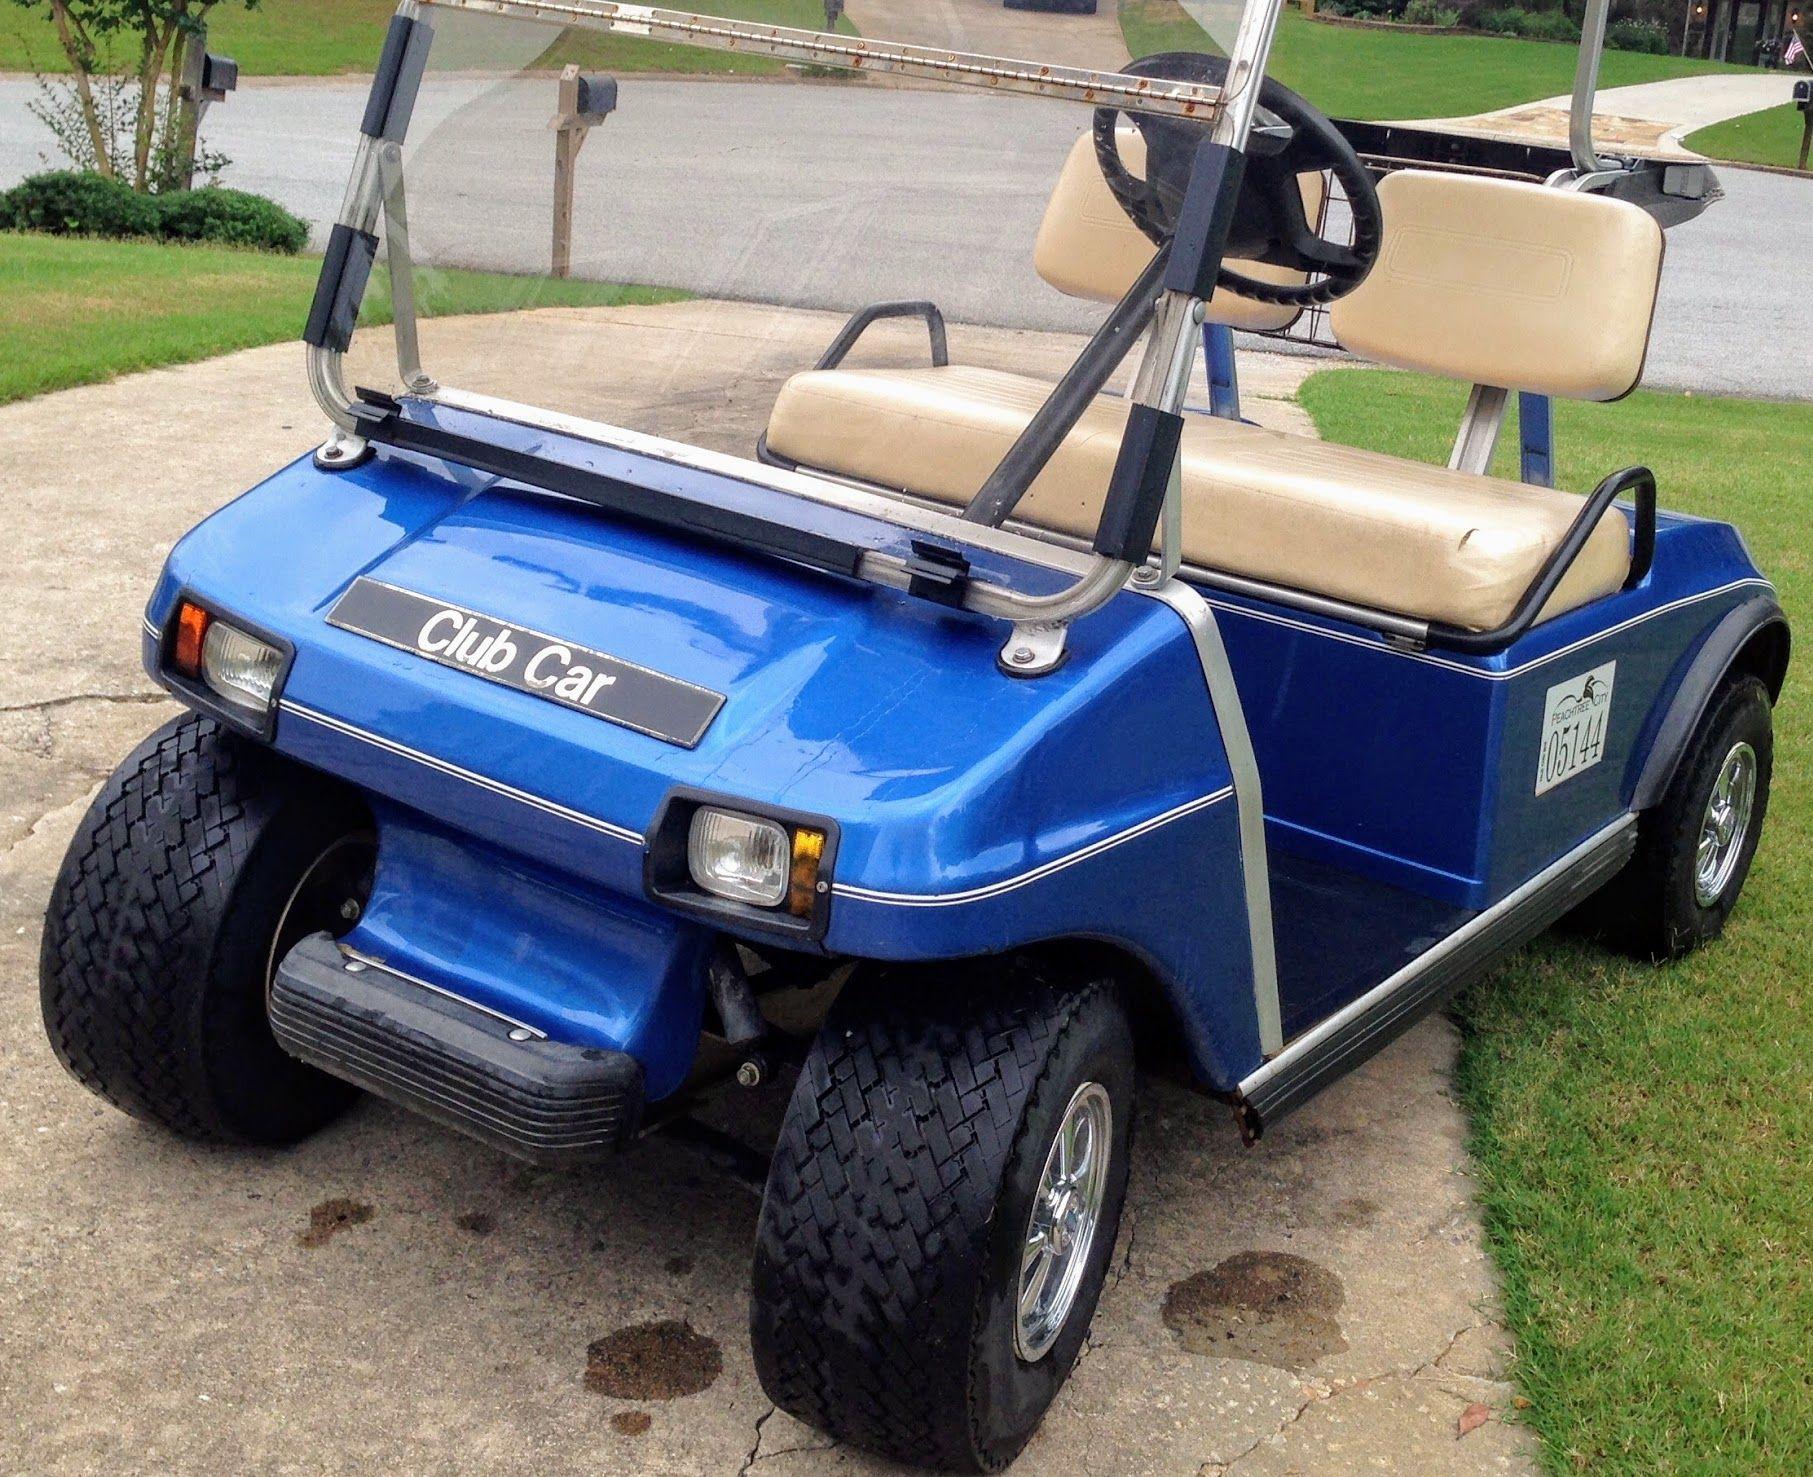 Club Car Golf Carts You Guide To Club Car Ownership Club Car Golf Cart Golf Carts Yamaha Golf Carts